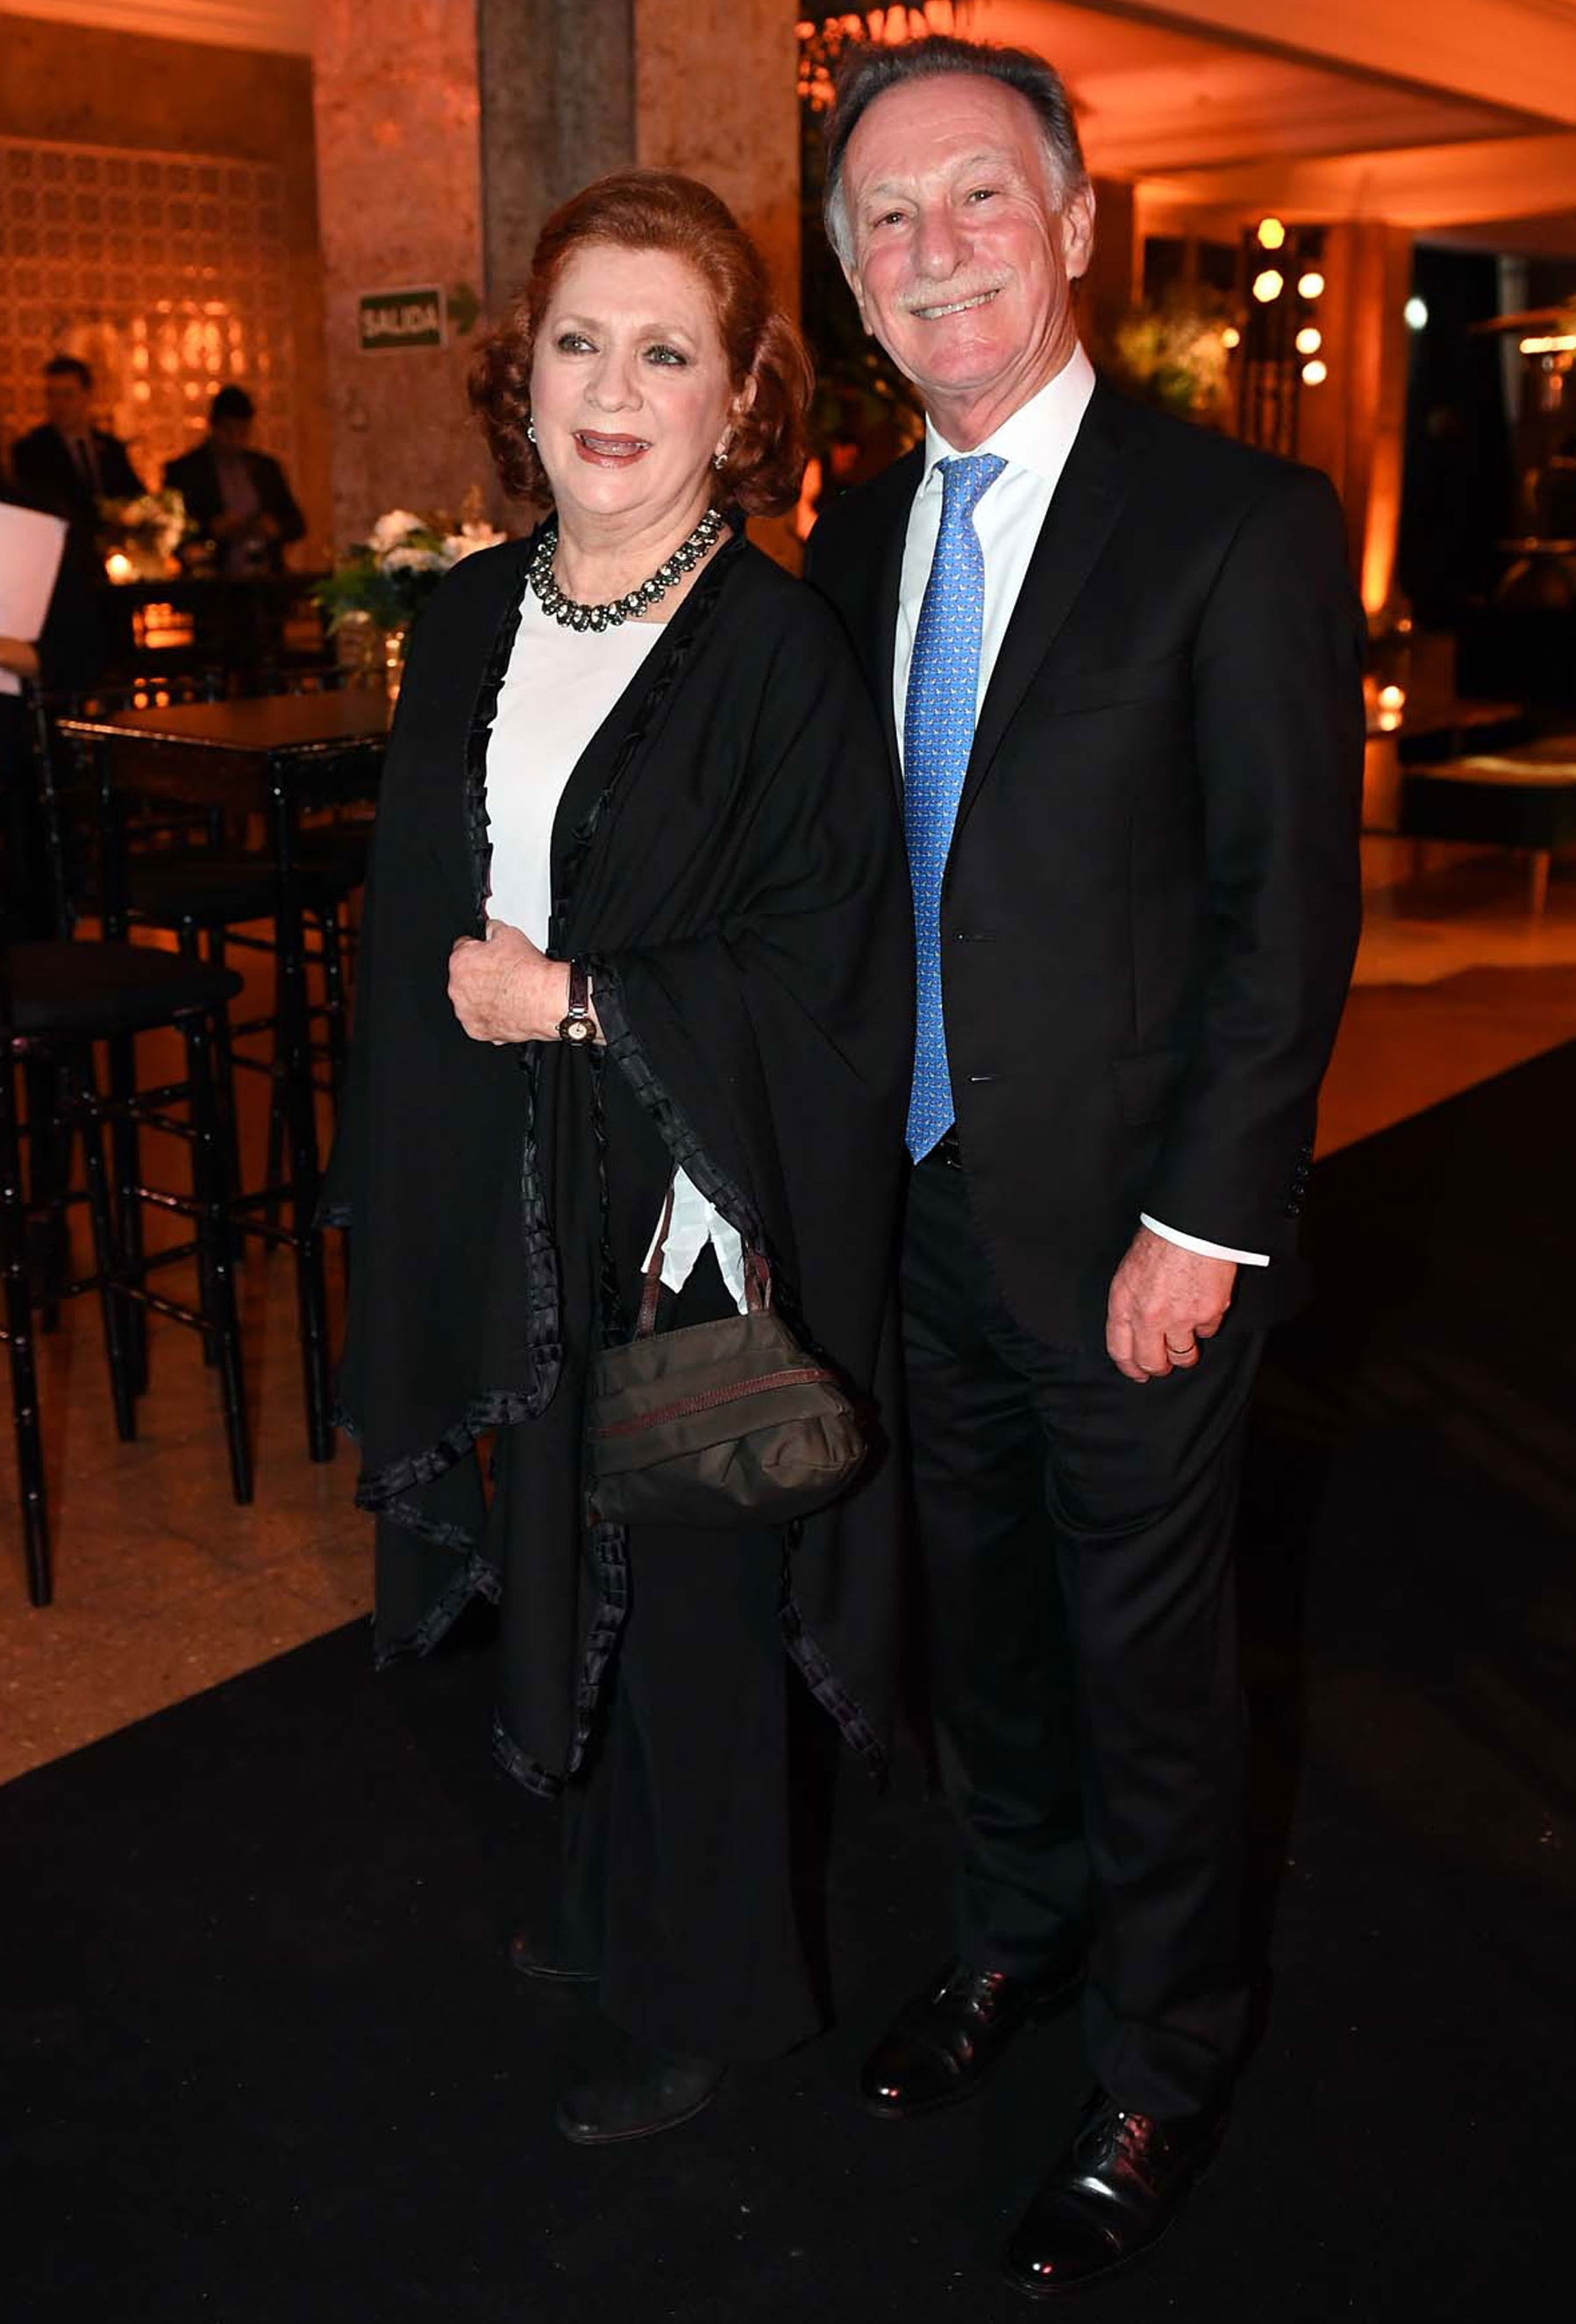 Teresa González Fernández y Gustavo Weiss